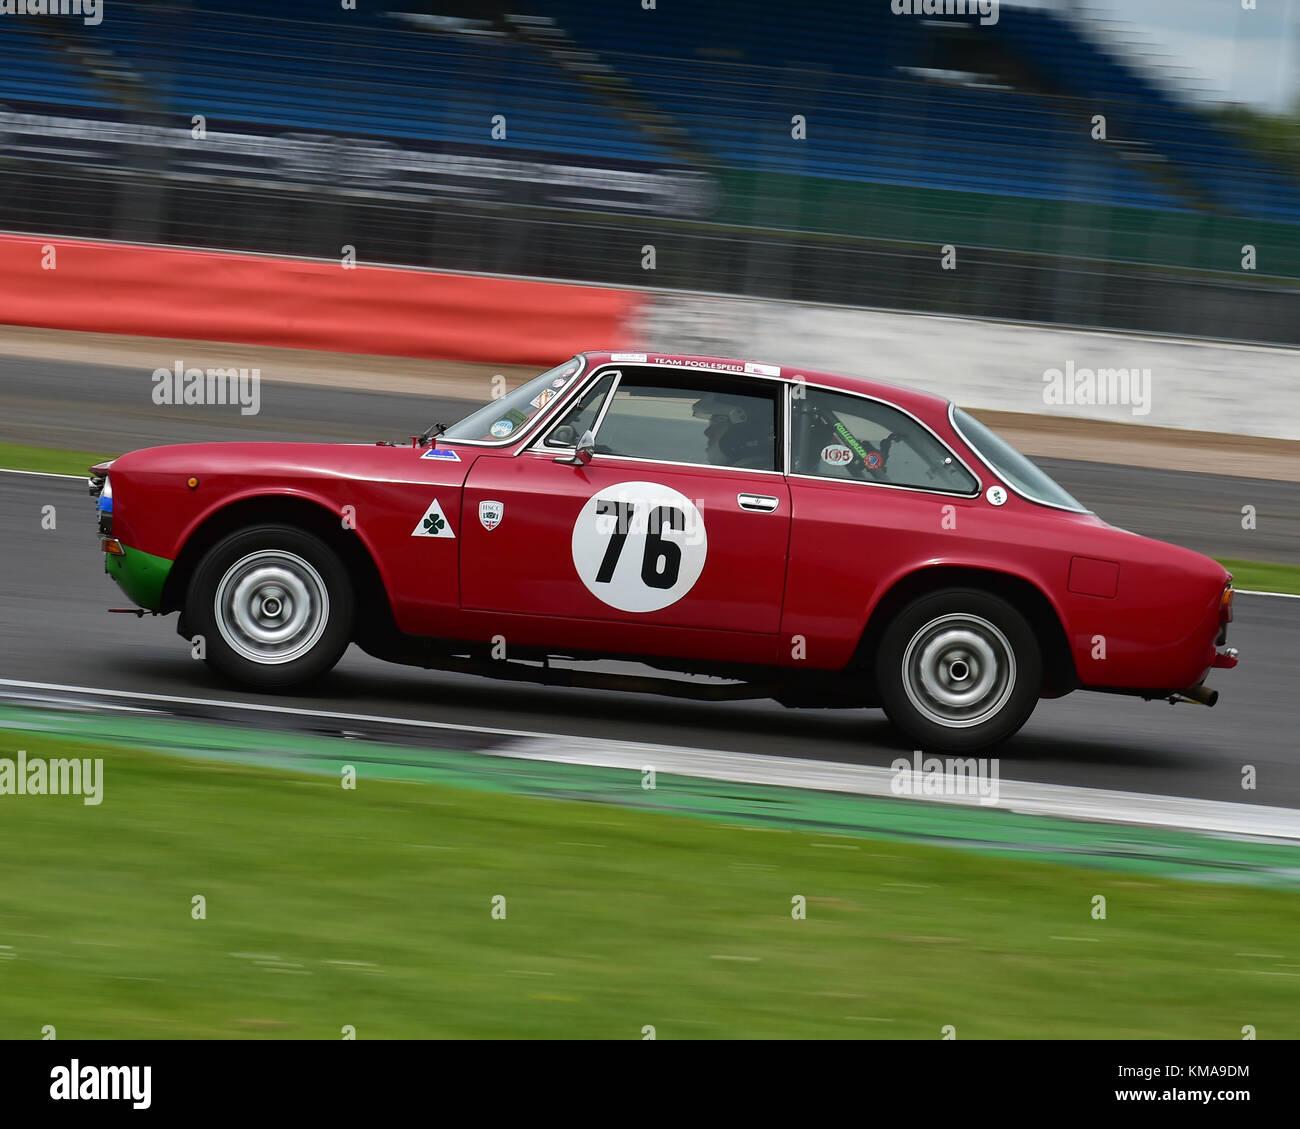 Alfa Romeo Gtv 2000 Stockfotos & Alfa Romeo Gtv 2000